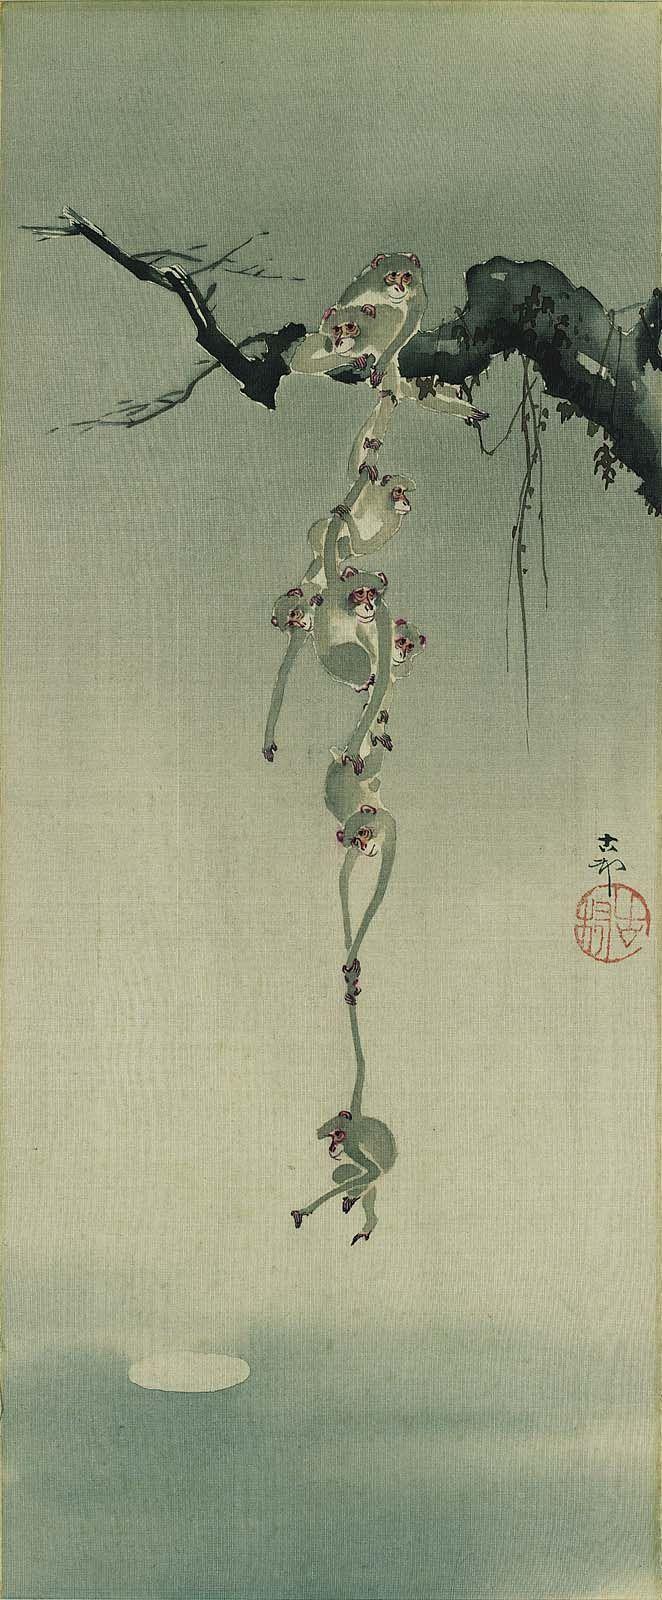 Monkeys Reaching for the Moon. 花鳥図(猿猴捉月) Japanese. Meiji era. beginning of 20th century. Ohara Koson (Japanese, 1878–1945)